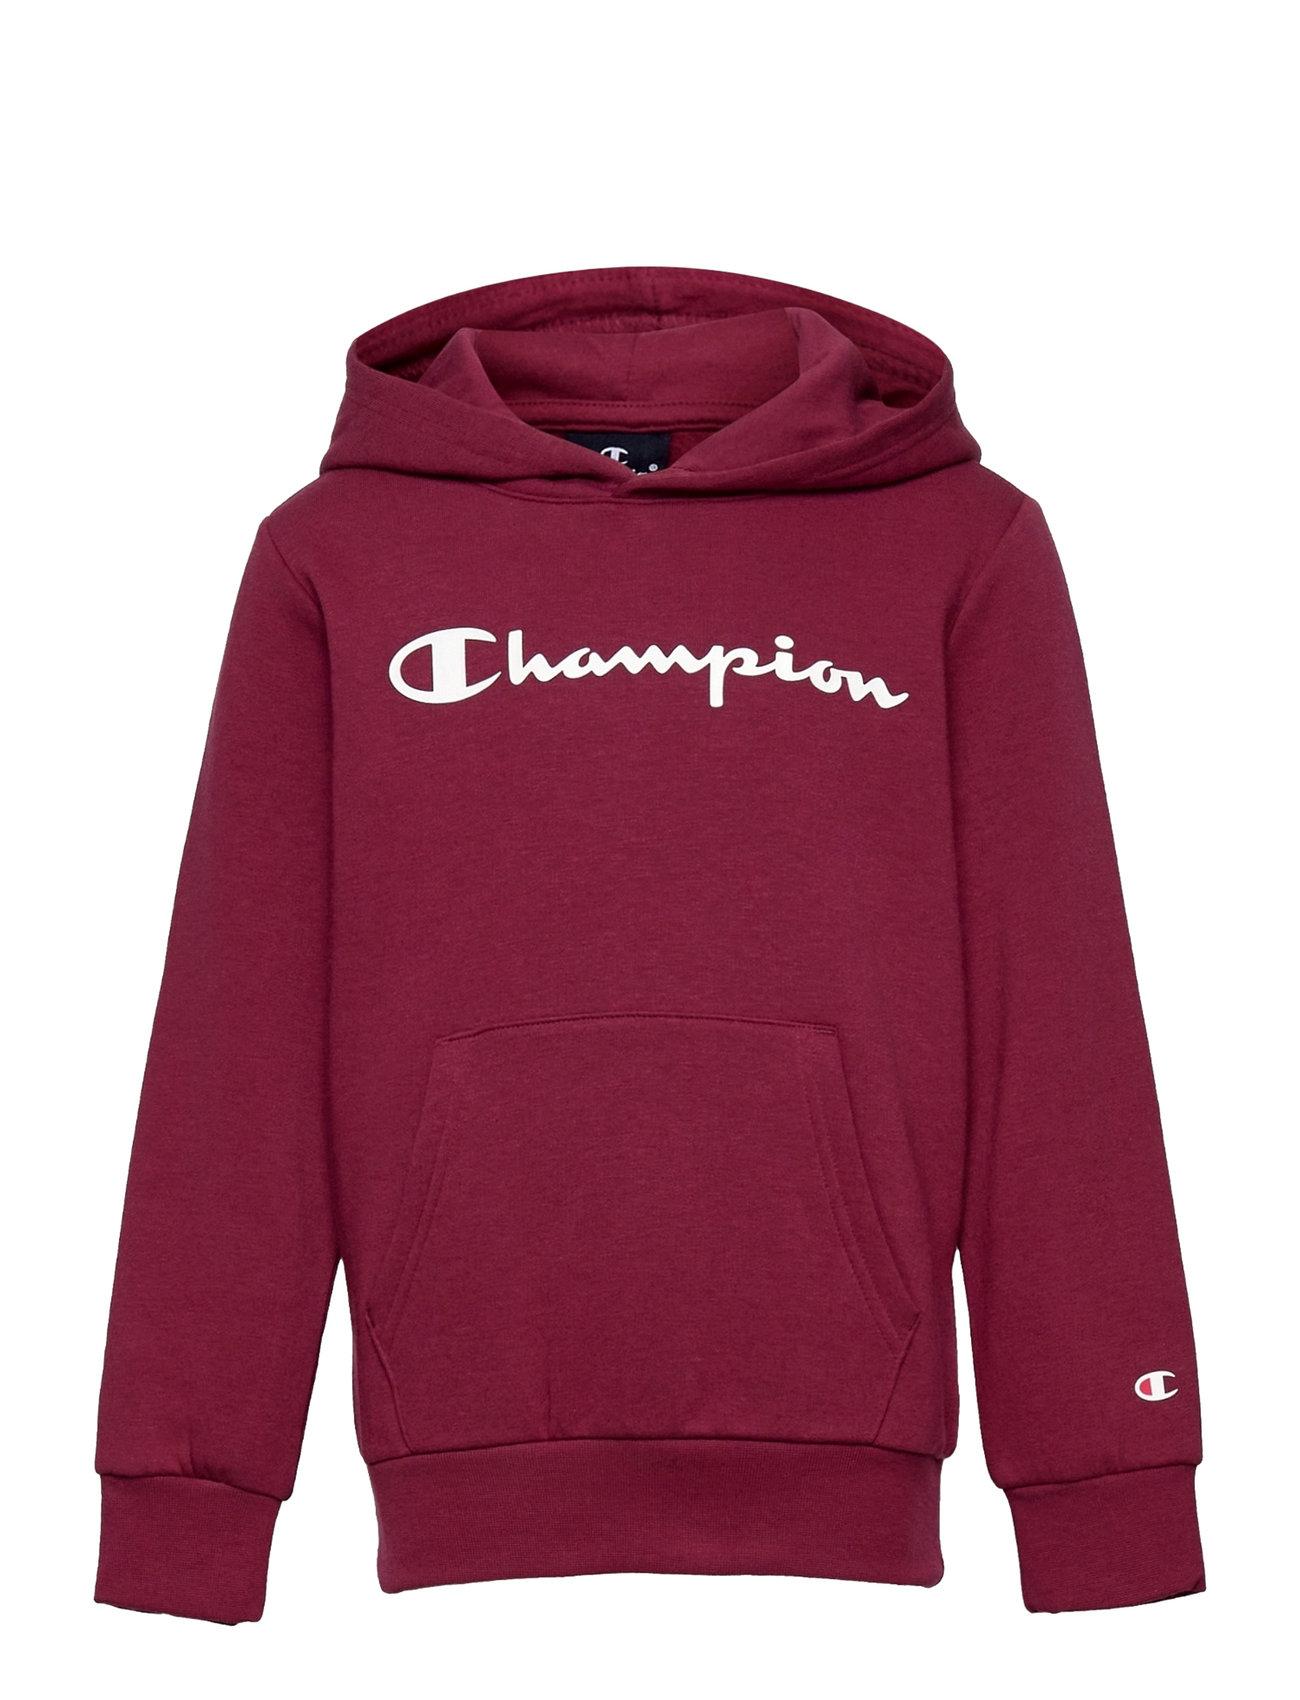 Hooded Sweatshirt Hoodie Trøje Lilla Champion